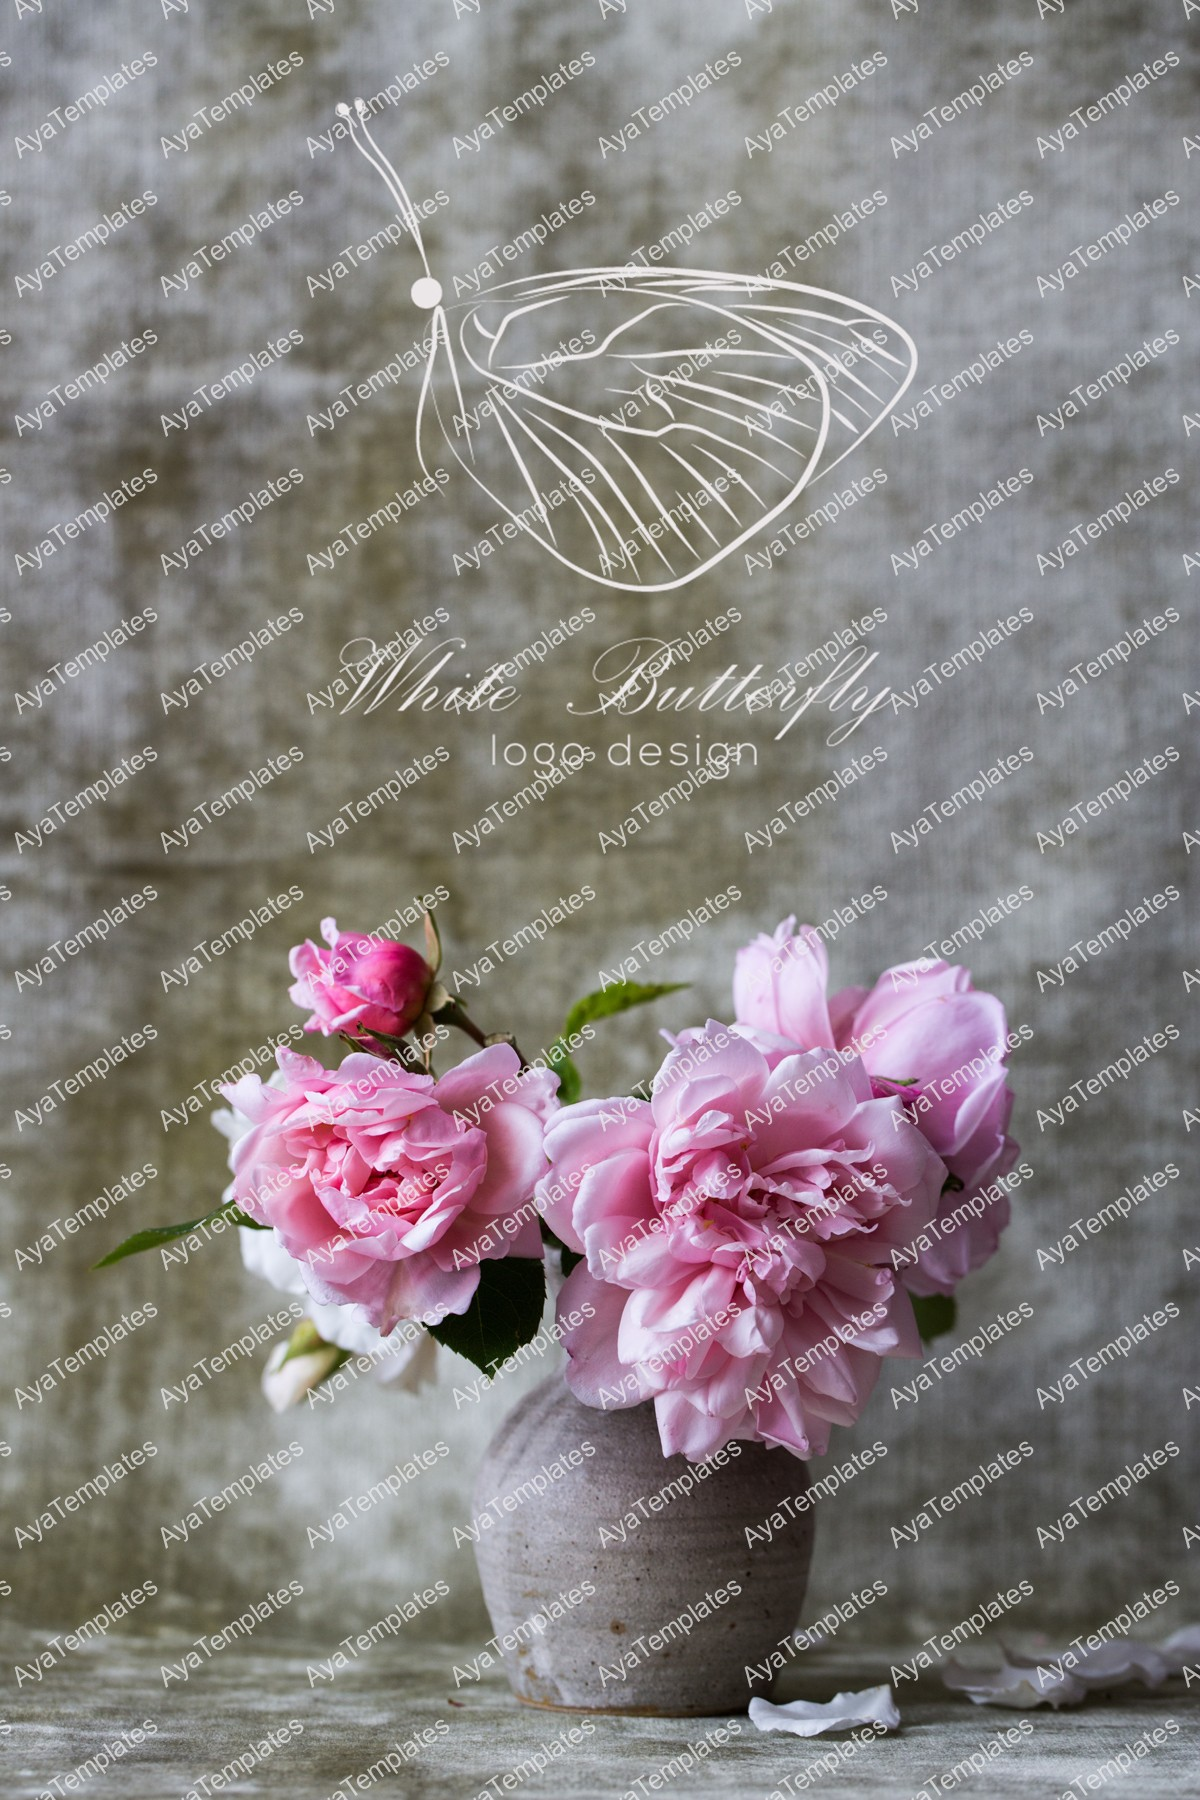 White-butterfly-logo-mockup